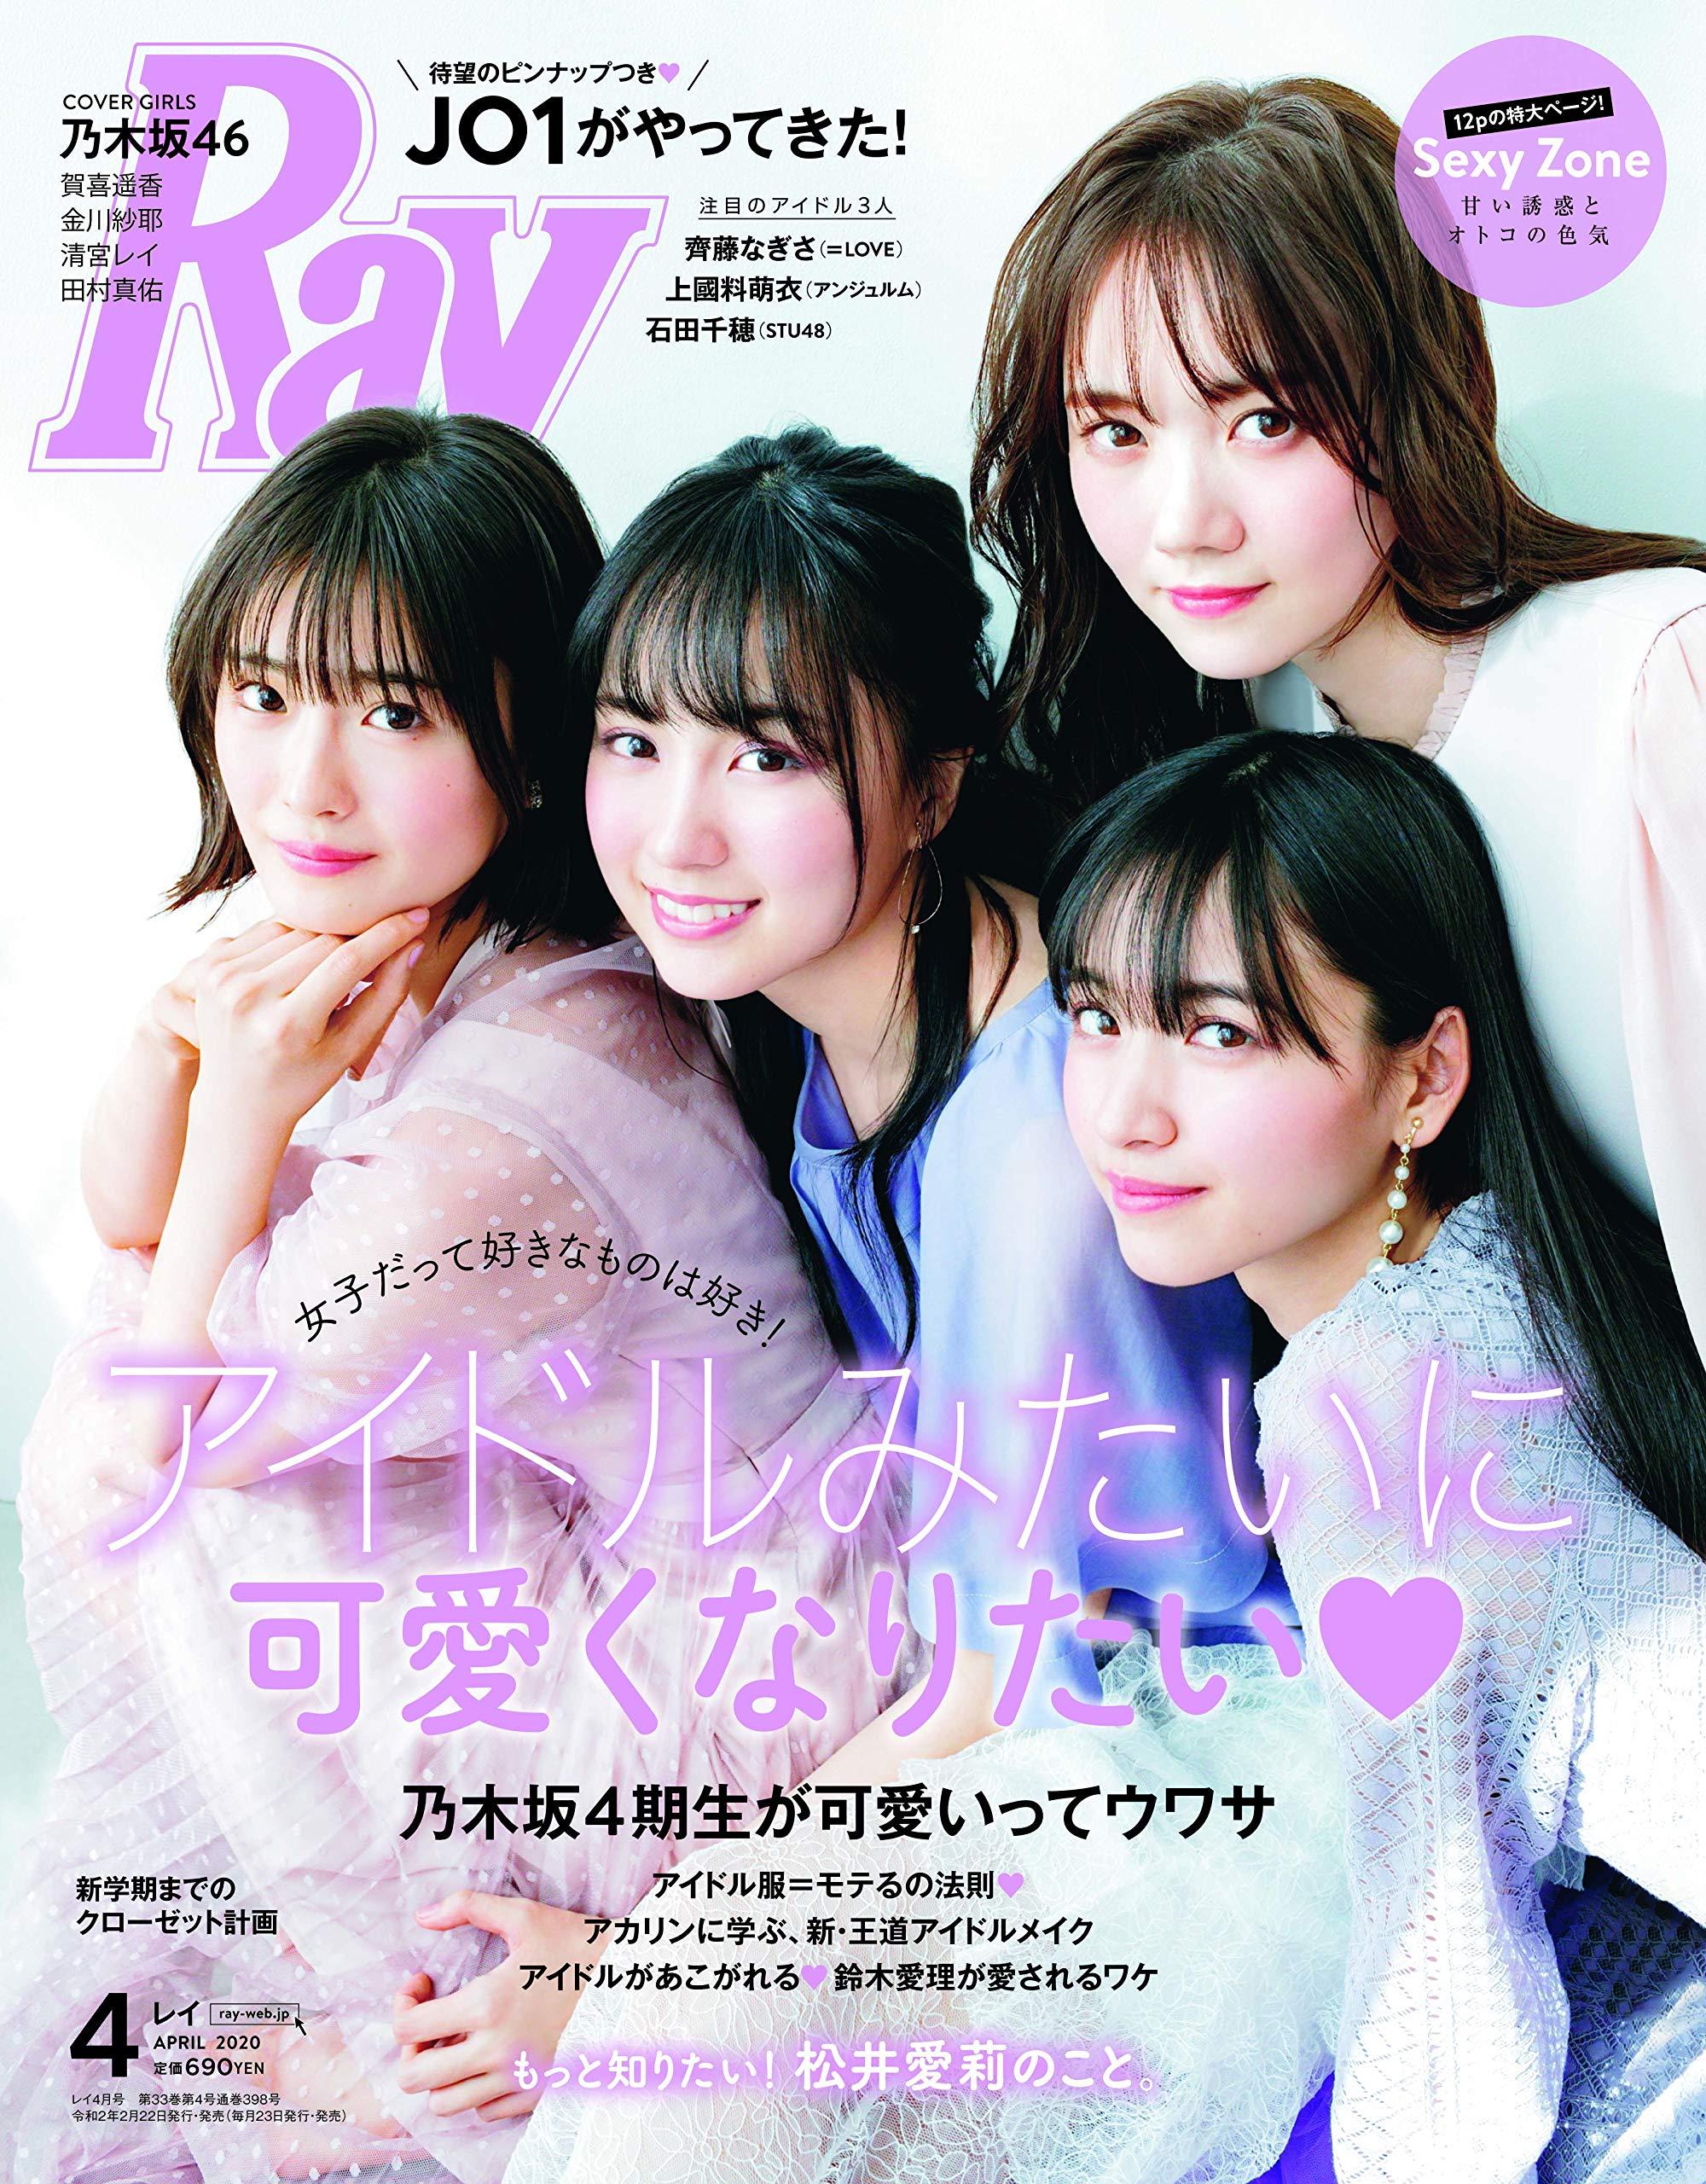 Ray (レイ) 2020年4月号 表紙 乃木坂46の4期生選抜